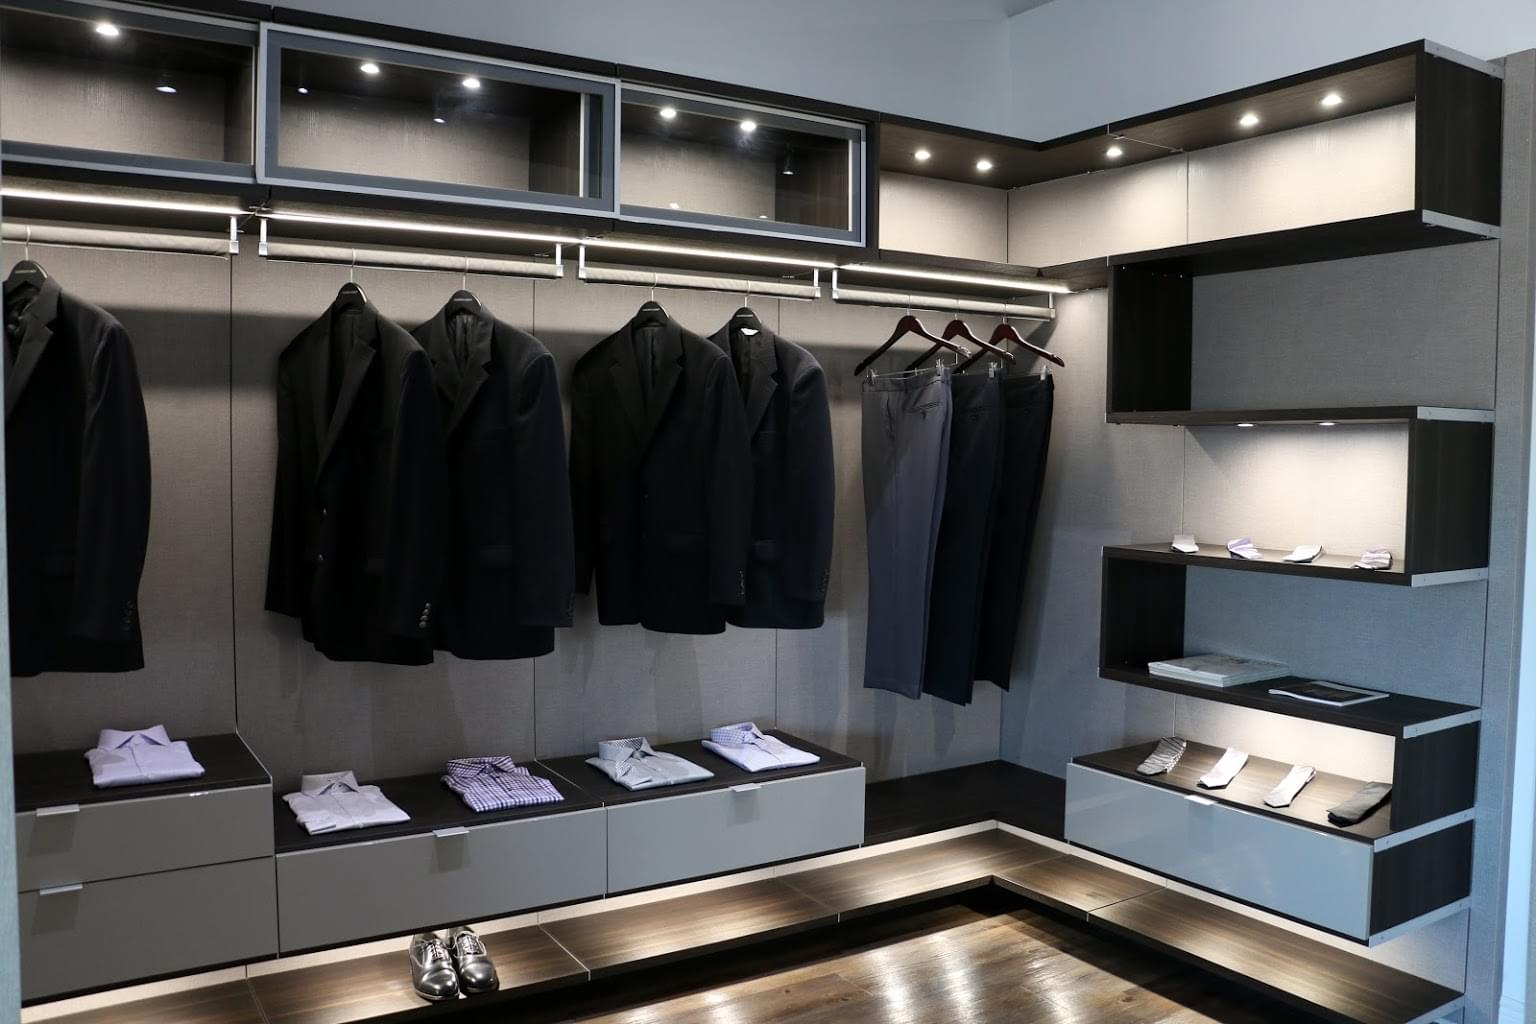 California closets conroe tx see inside interior for Interior design 08003